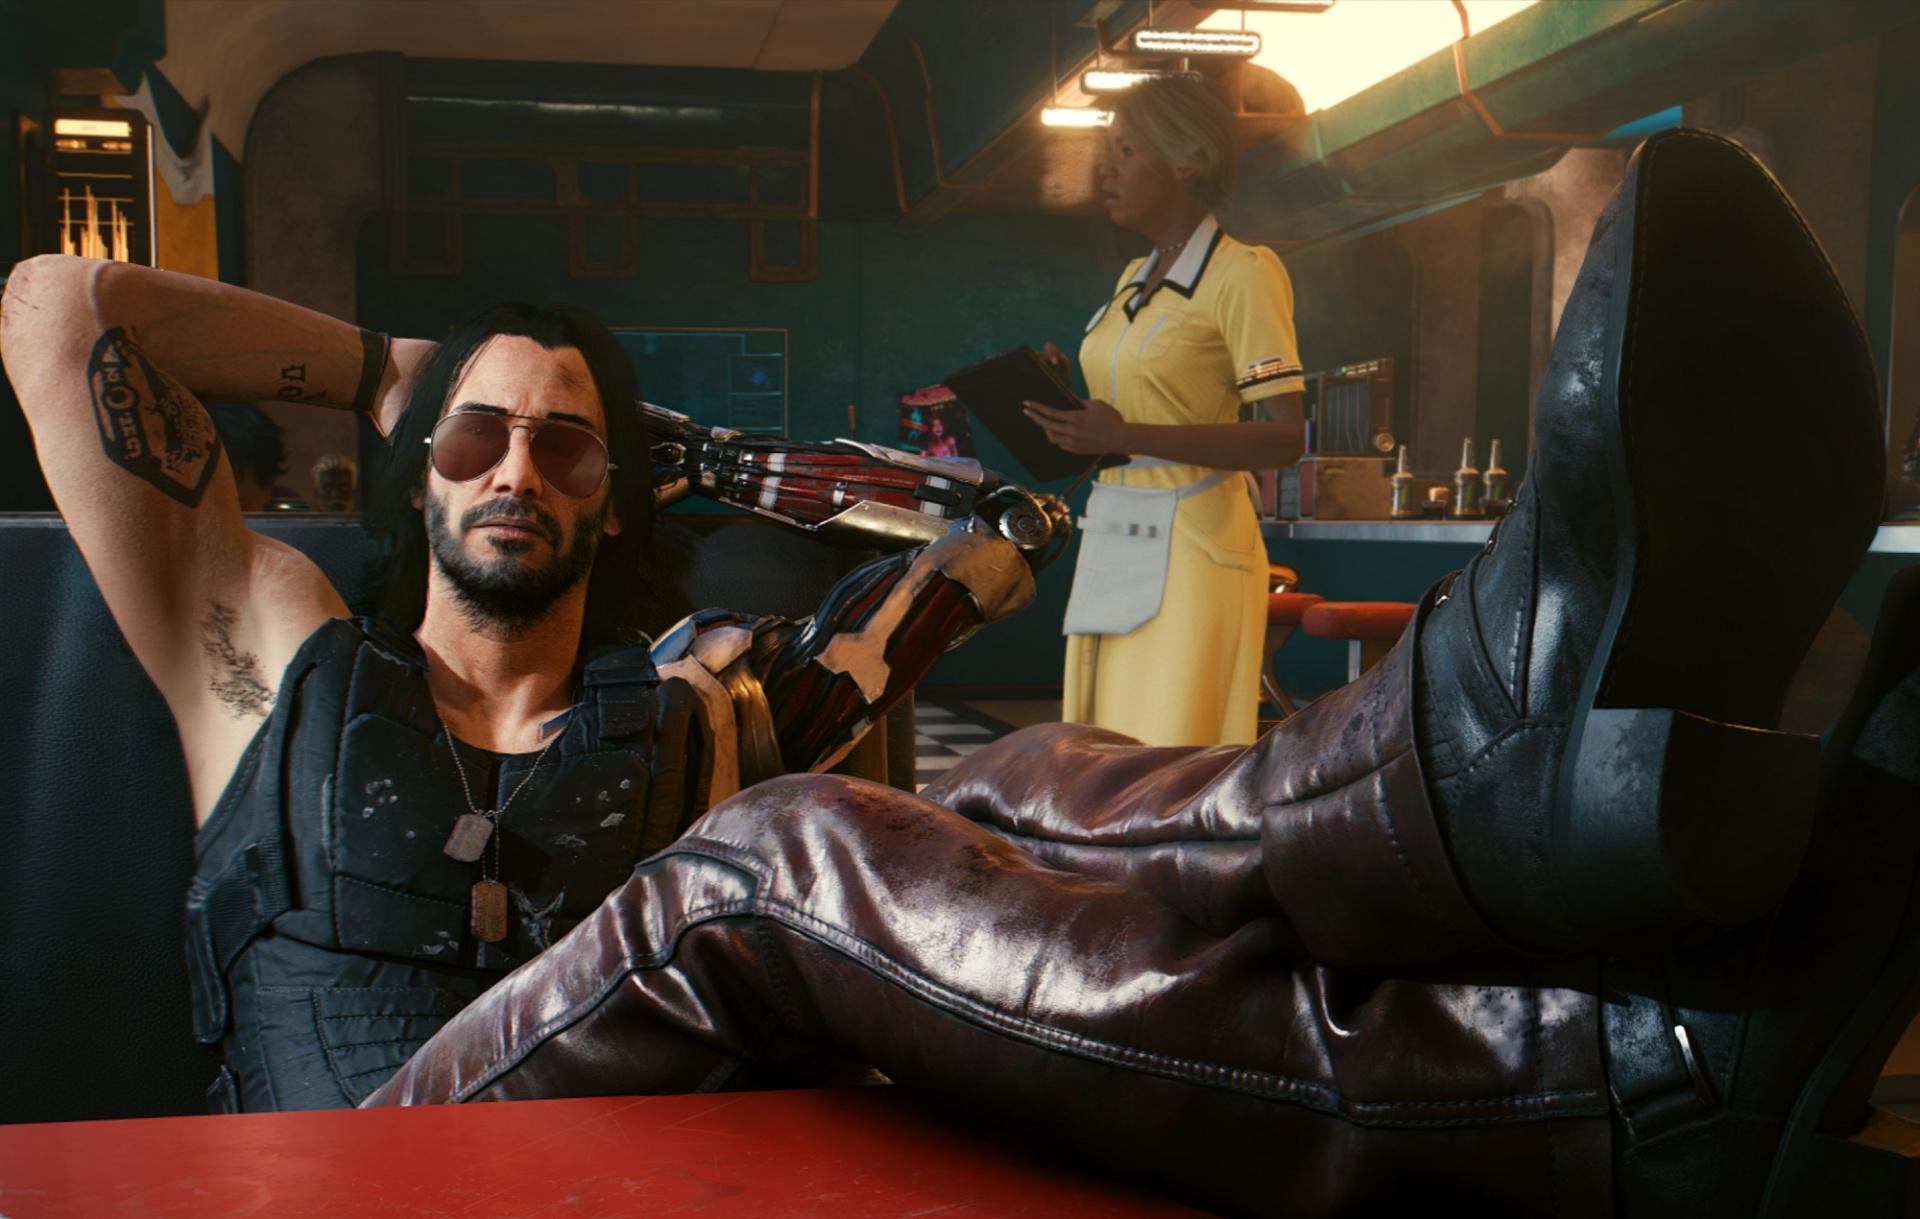 «М.Видео» и «Эльдорадо» будут продавать бандл Xbox Series X с Cyberpunk2077